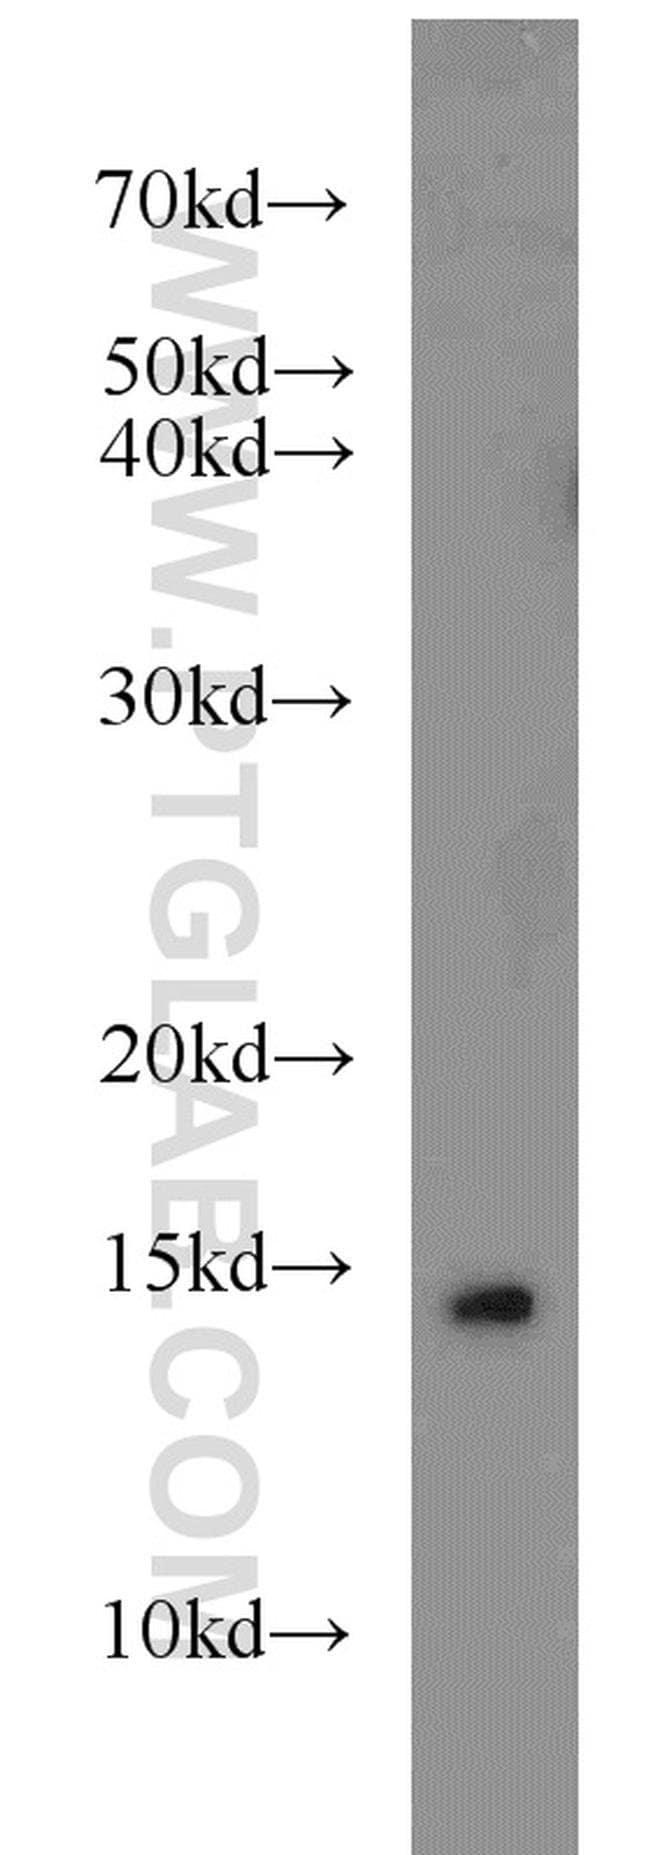 SNRPD3 Rabbit anti-Human, Mouse, Rat, Polyclonal, Proteintech 150 μL; Unconjugated Ver productos